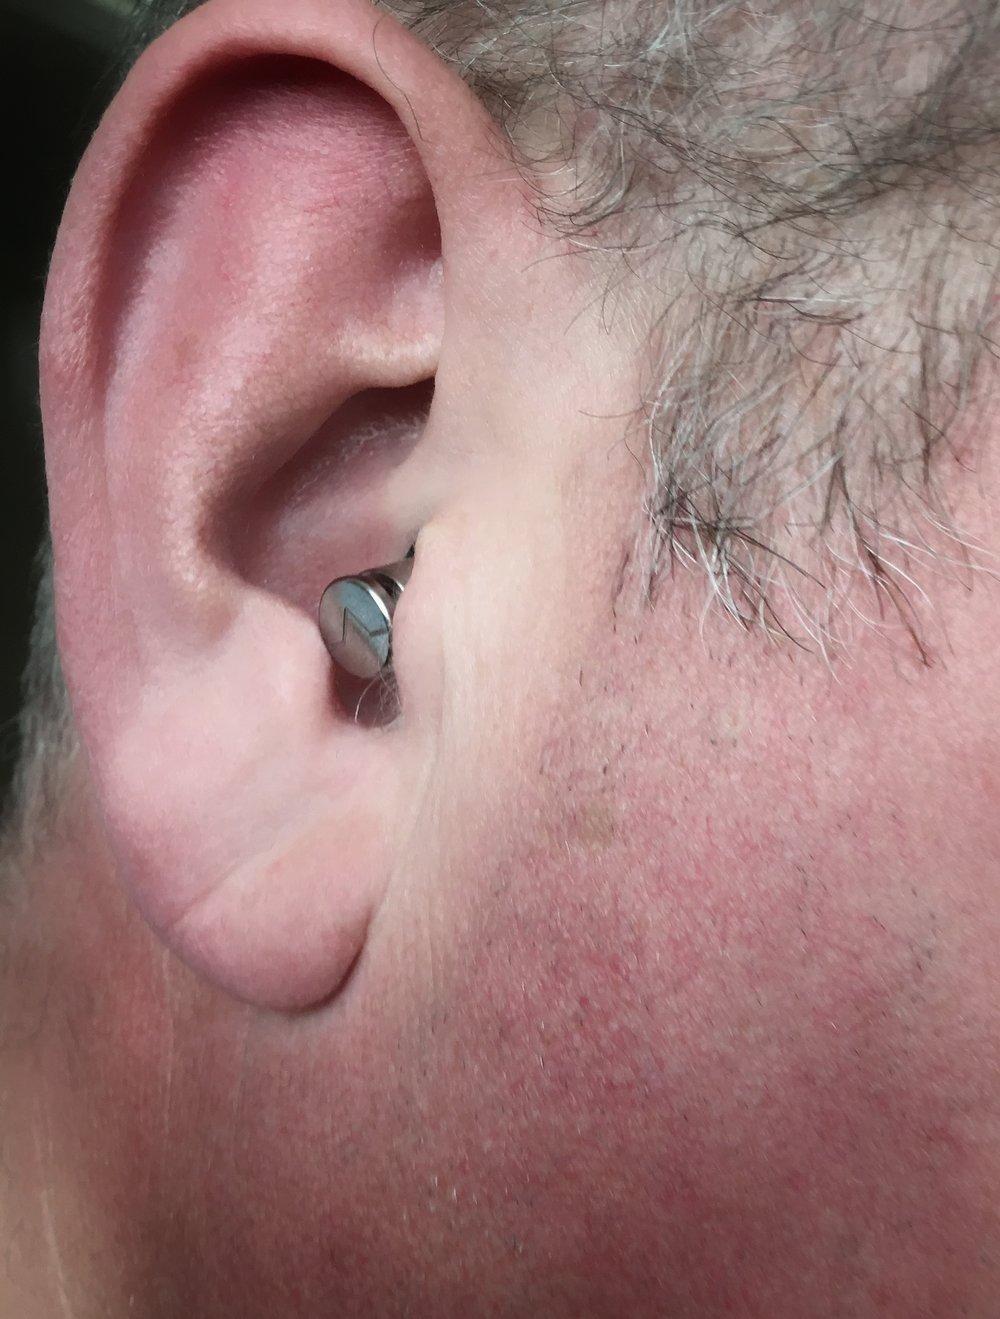 ISOLATE ear plug in use